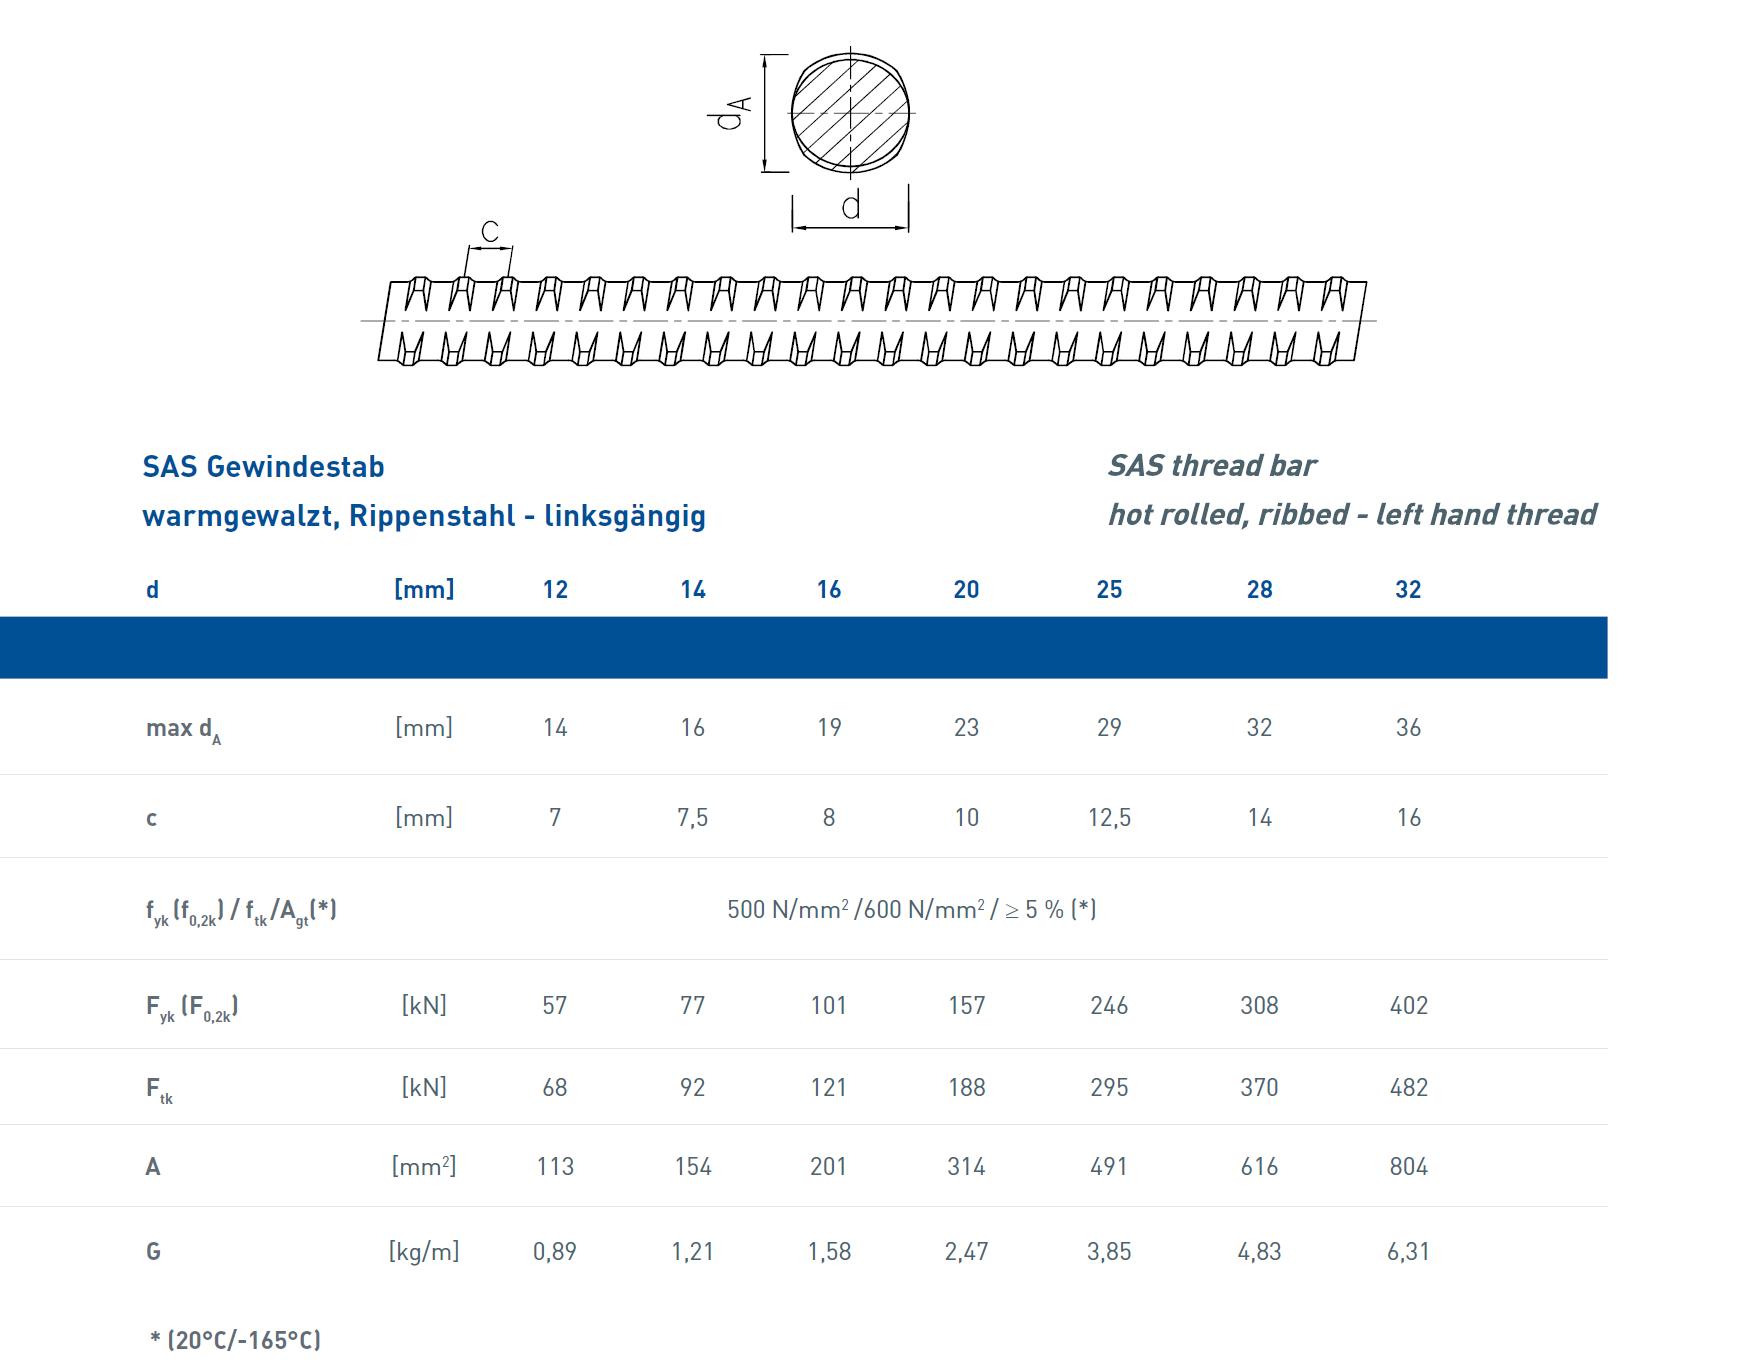 ULTS Bar Overview